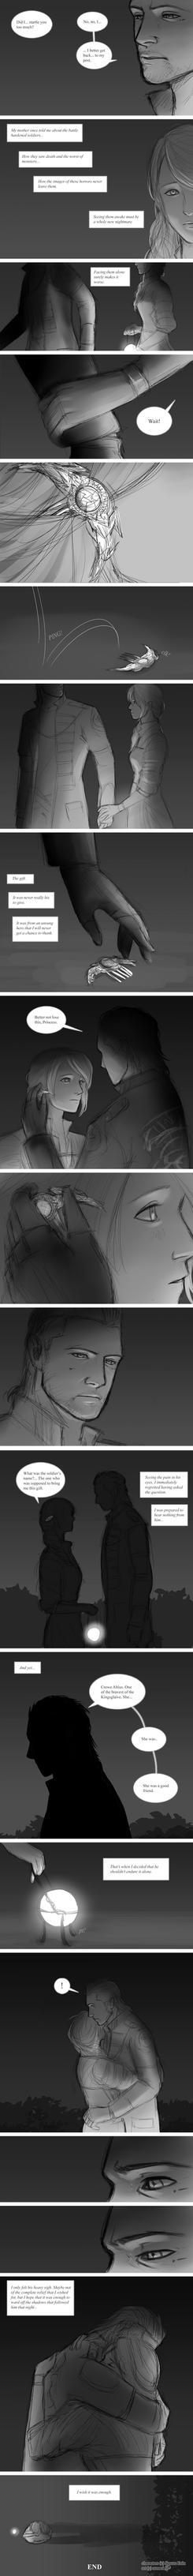 Shadows in the Garden - Part 4 by annaoi